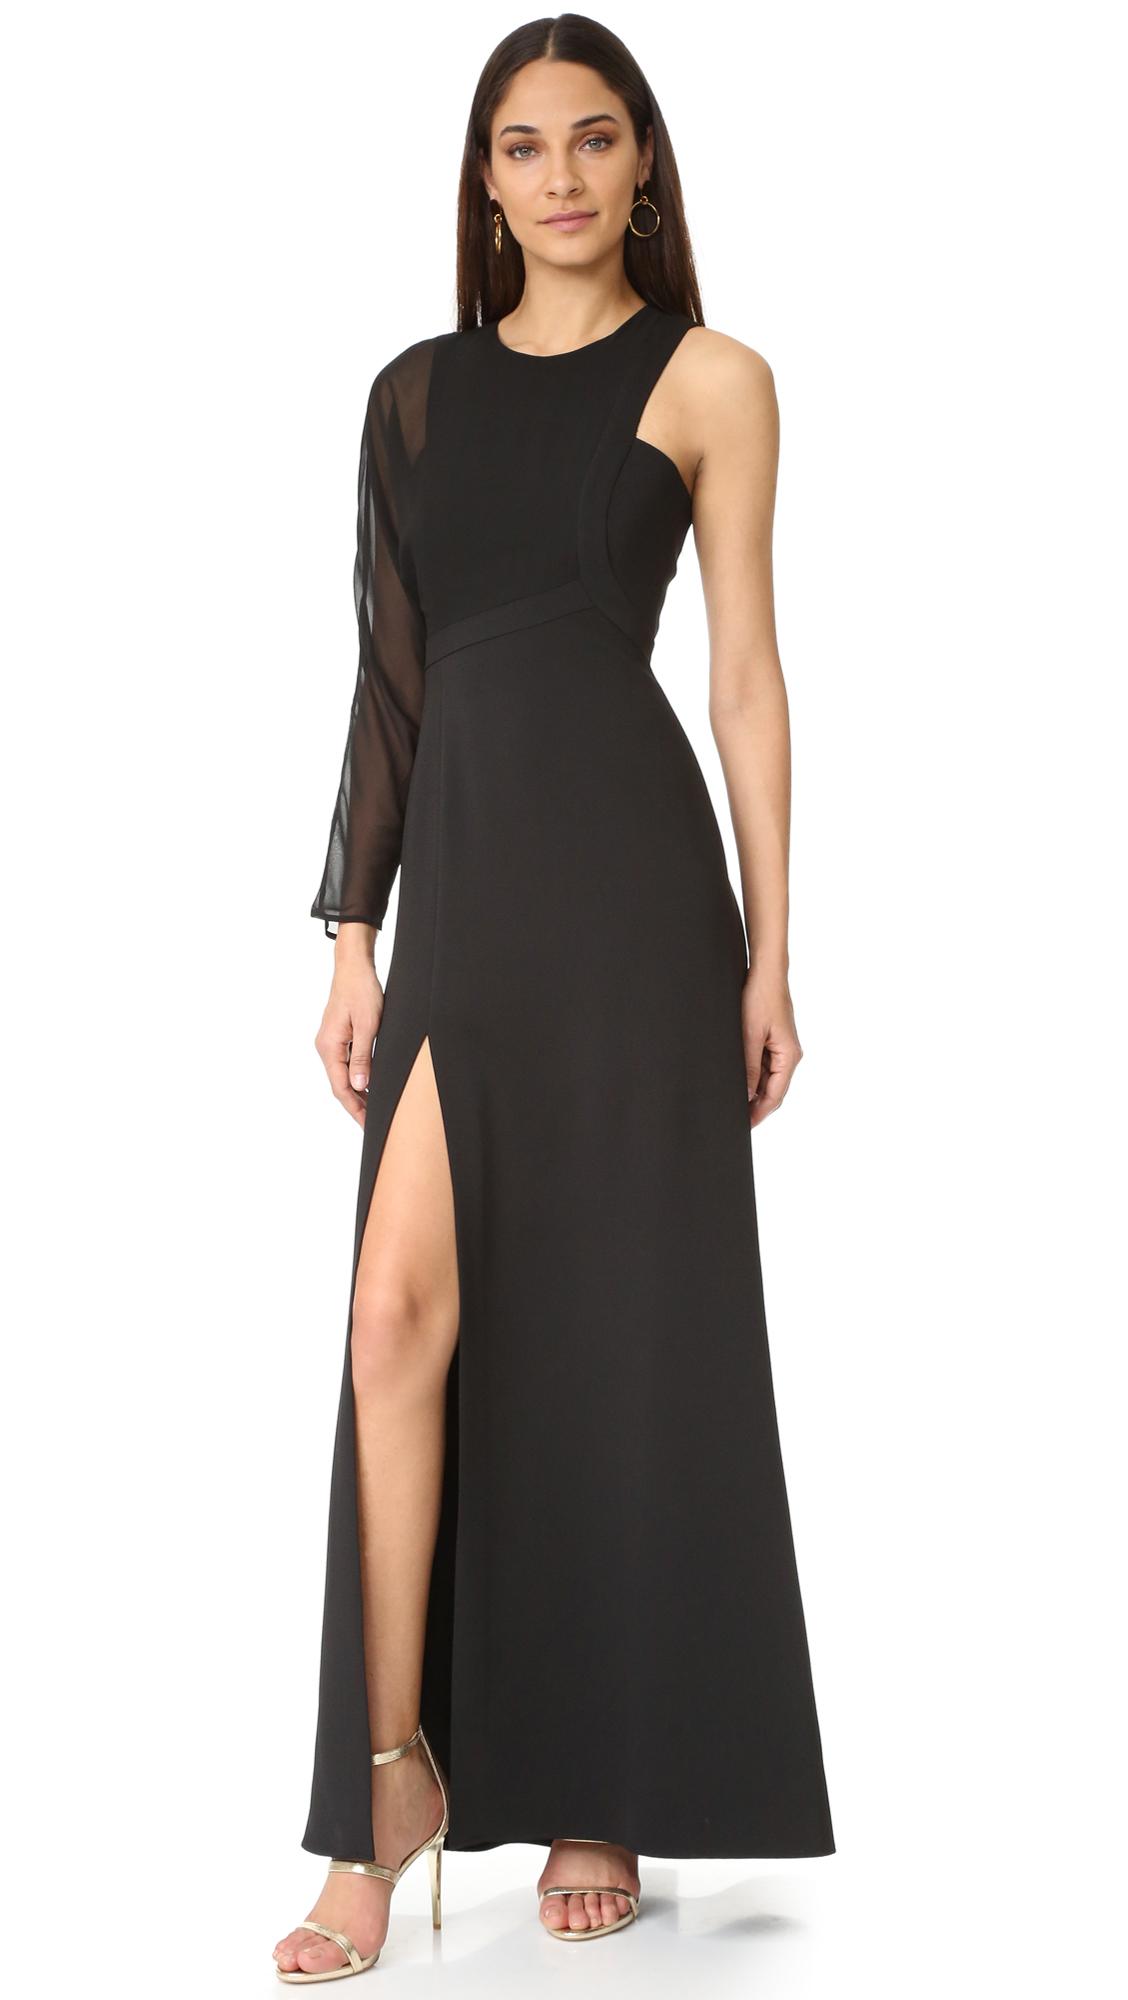 Bcbgmaxazria One Shoulder Gown - Black at Shopbop